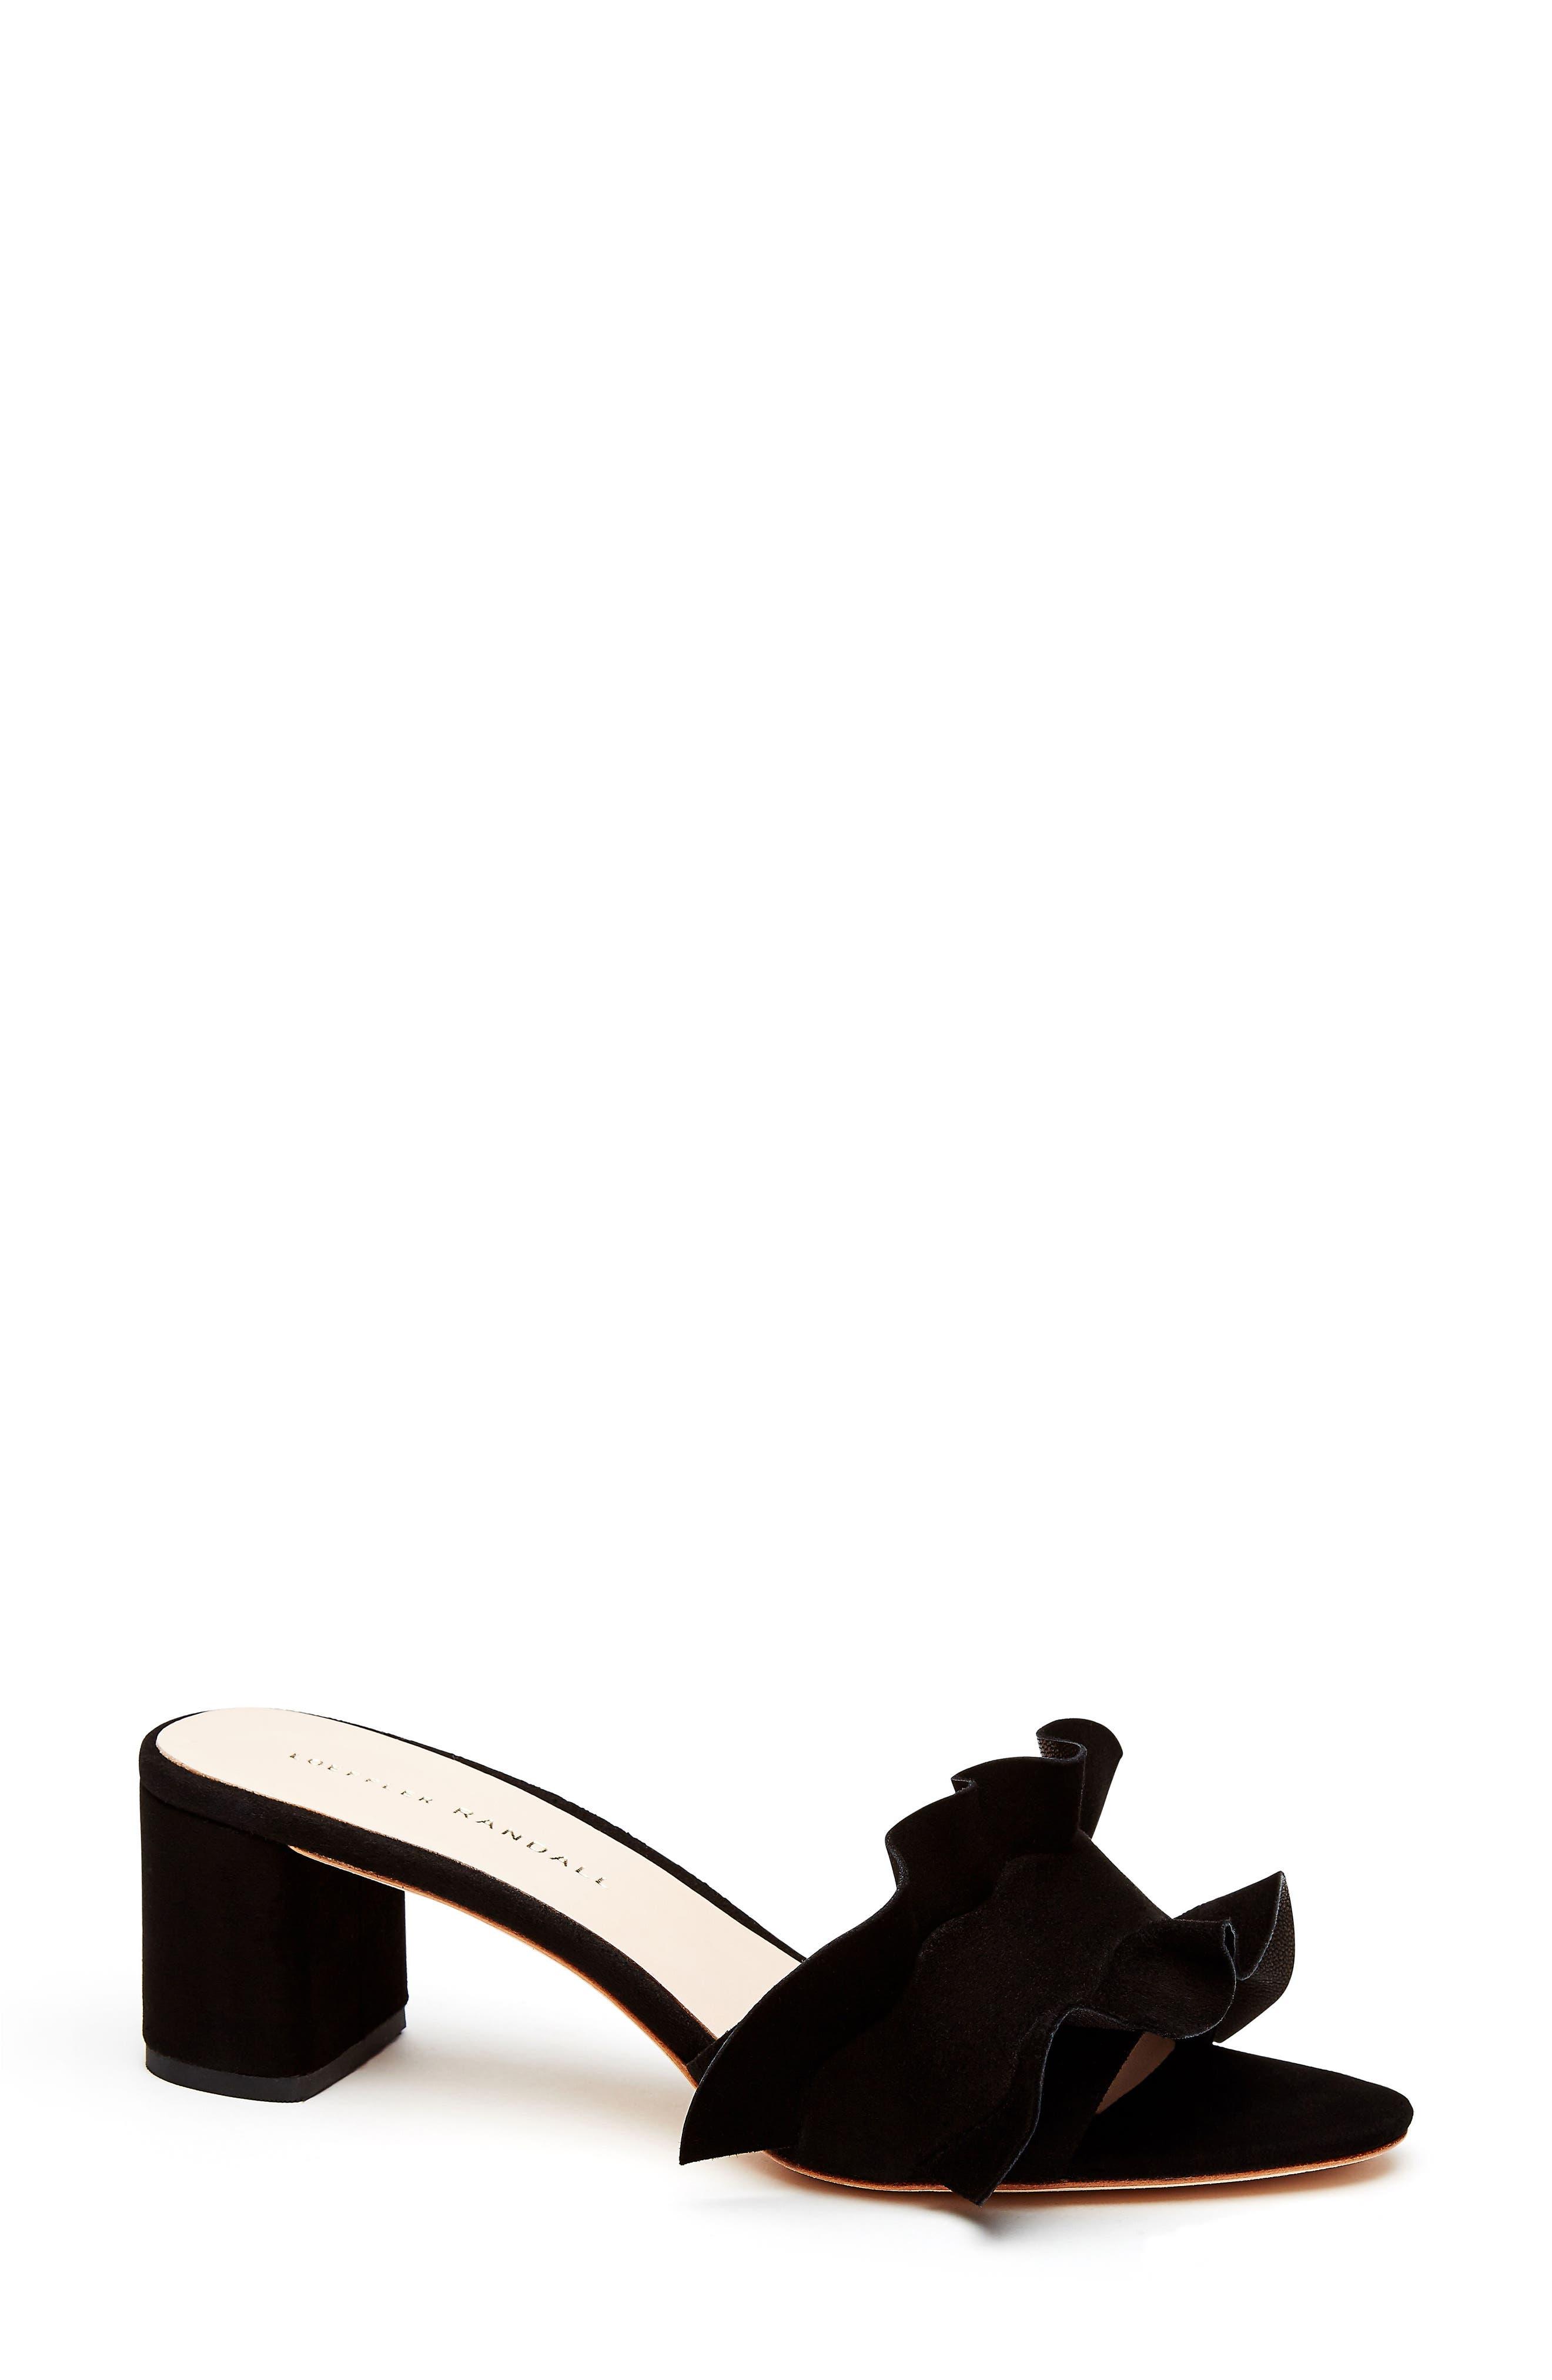 Vera Ruffled Slide Sandal,                         Main,                         color, Black Suede